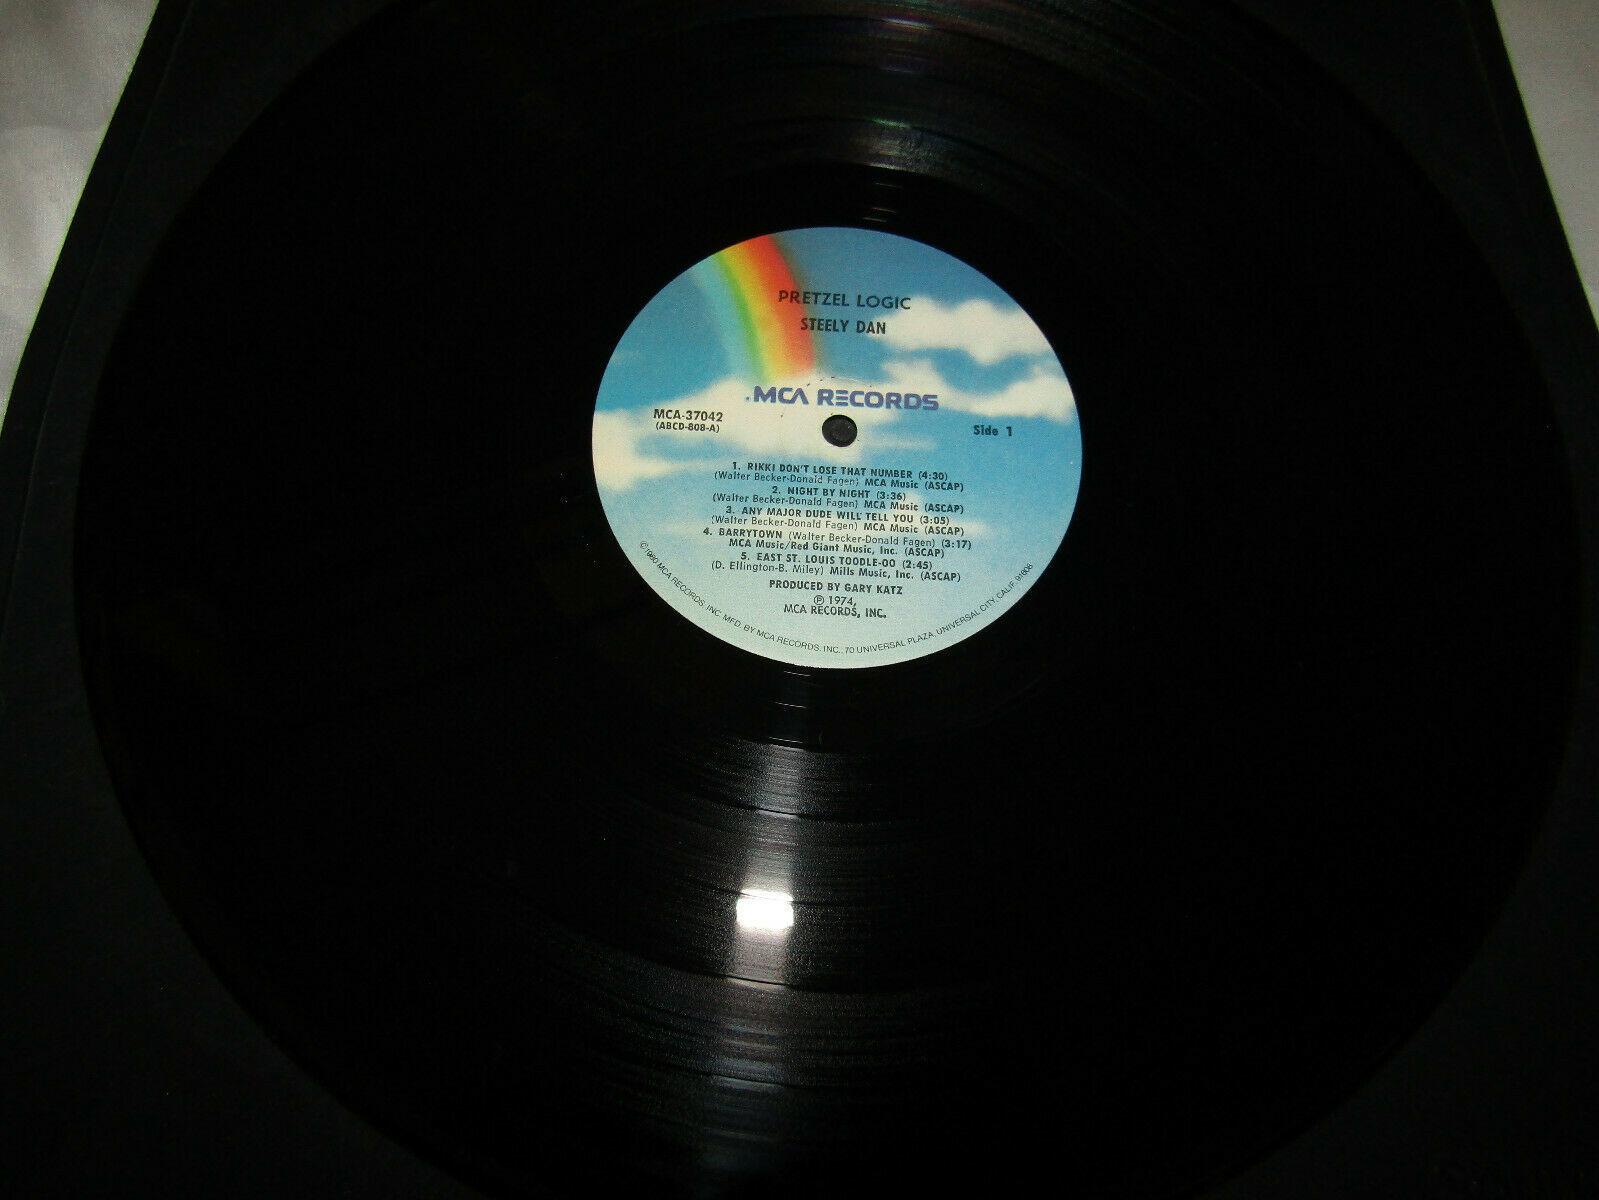 Steely Dan Pretzel Logic MCA MCA-37042 Stereo Vinyl Record LP image 3